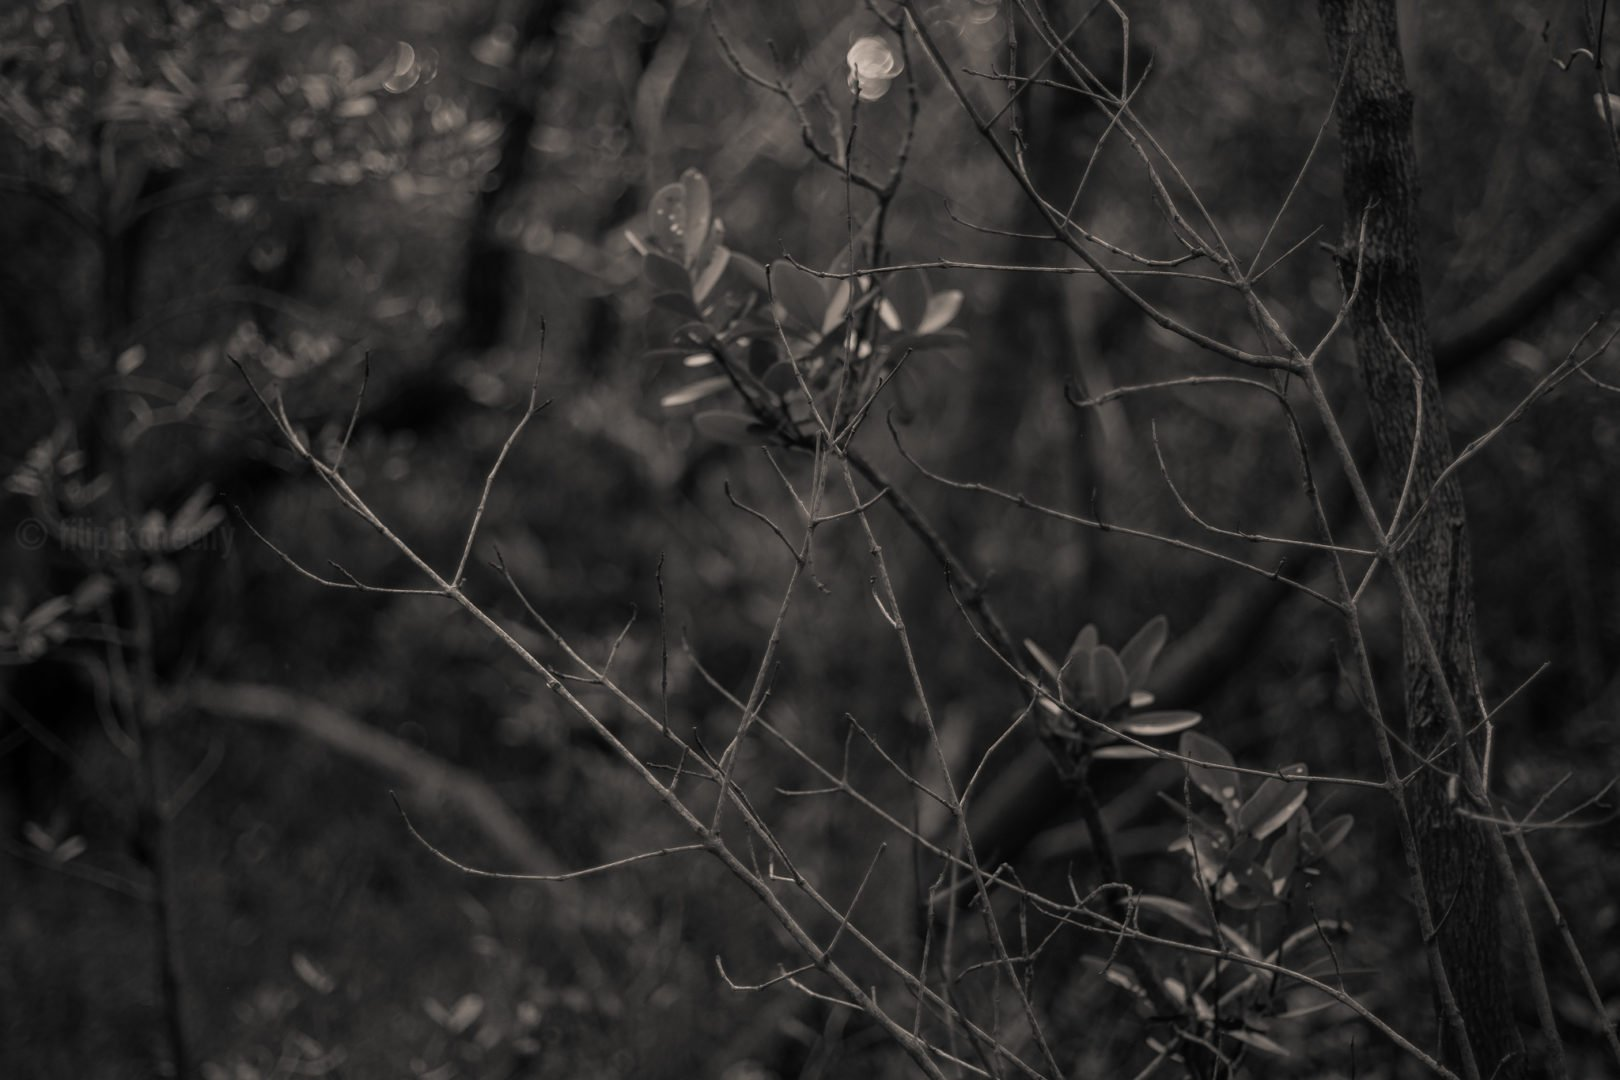 black and white photo of florida woods